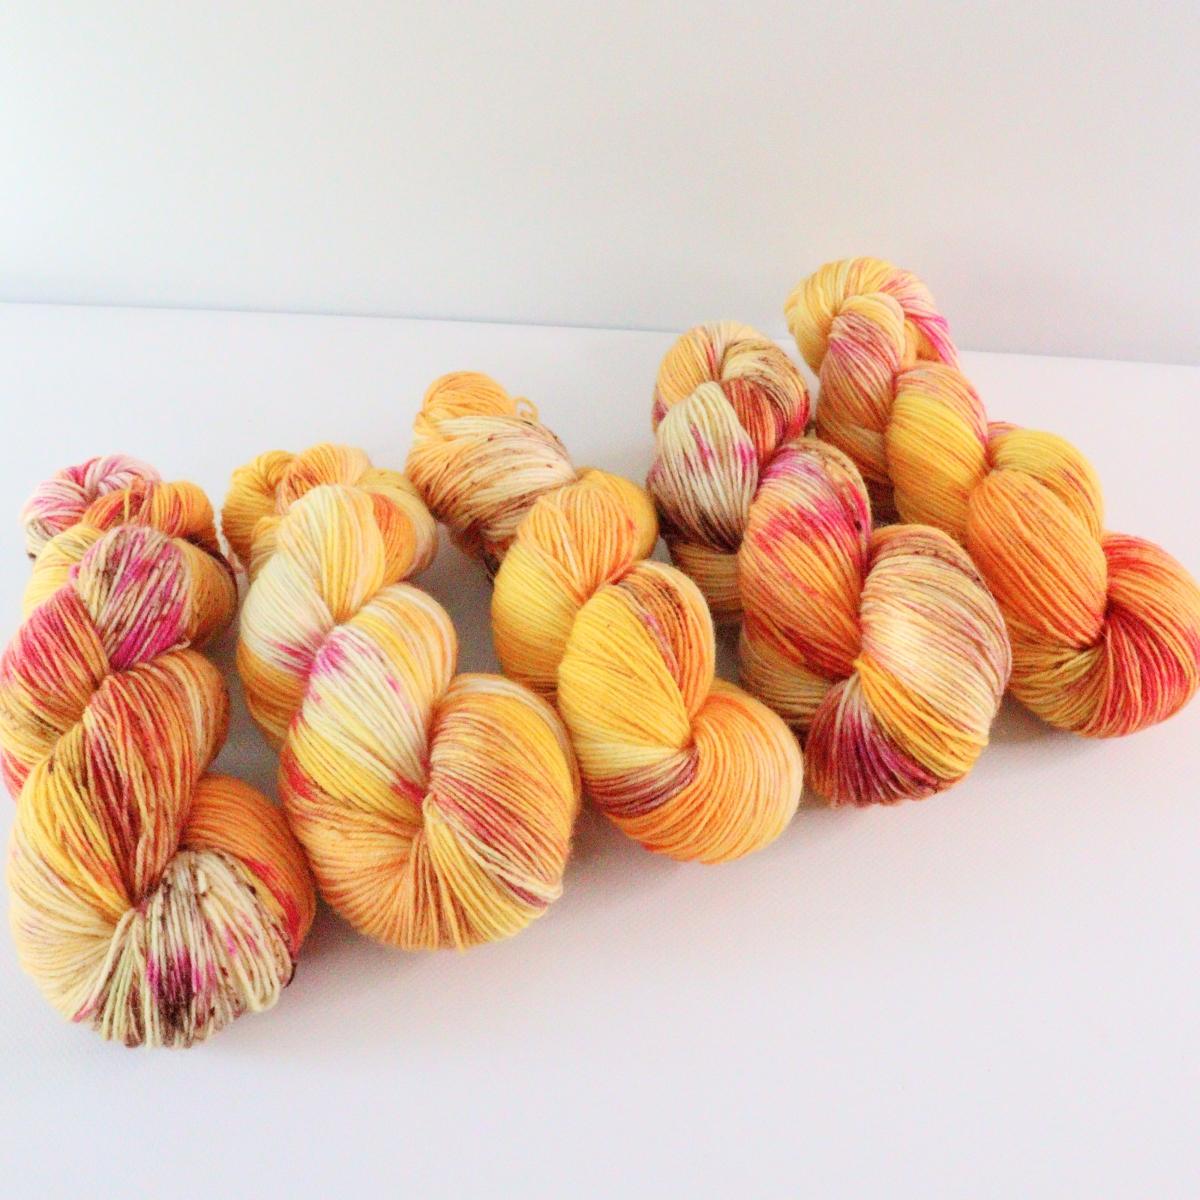 woodico.pro hand dyed yarn 071 5 1200x1200 - Hand dyed yarn / 071